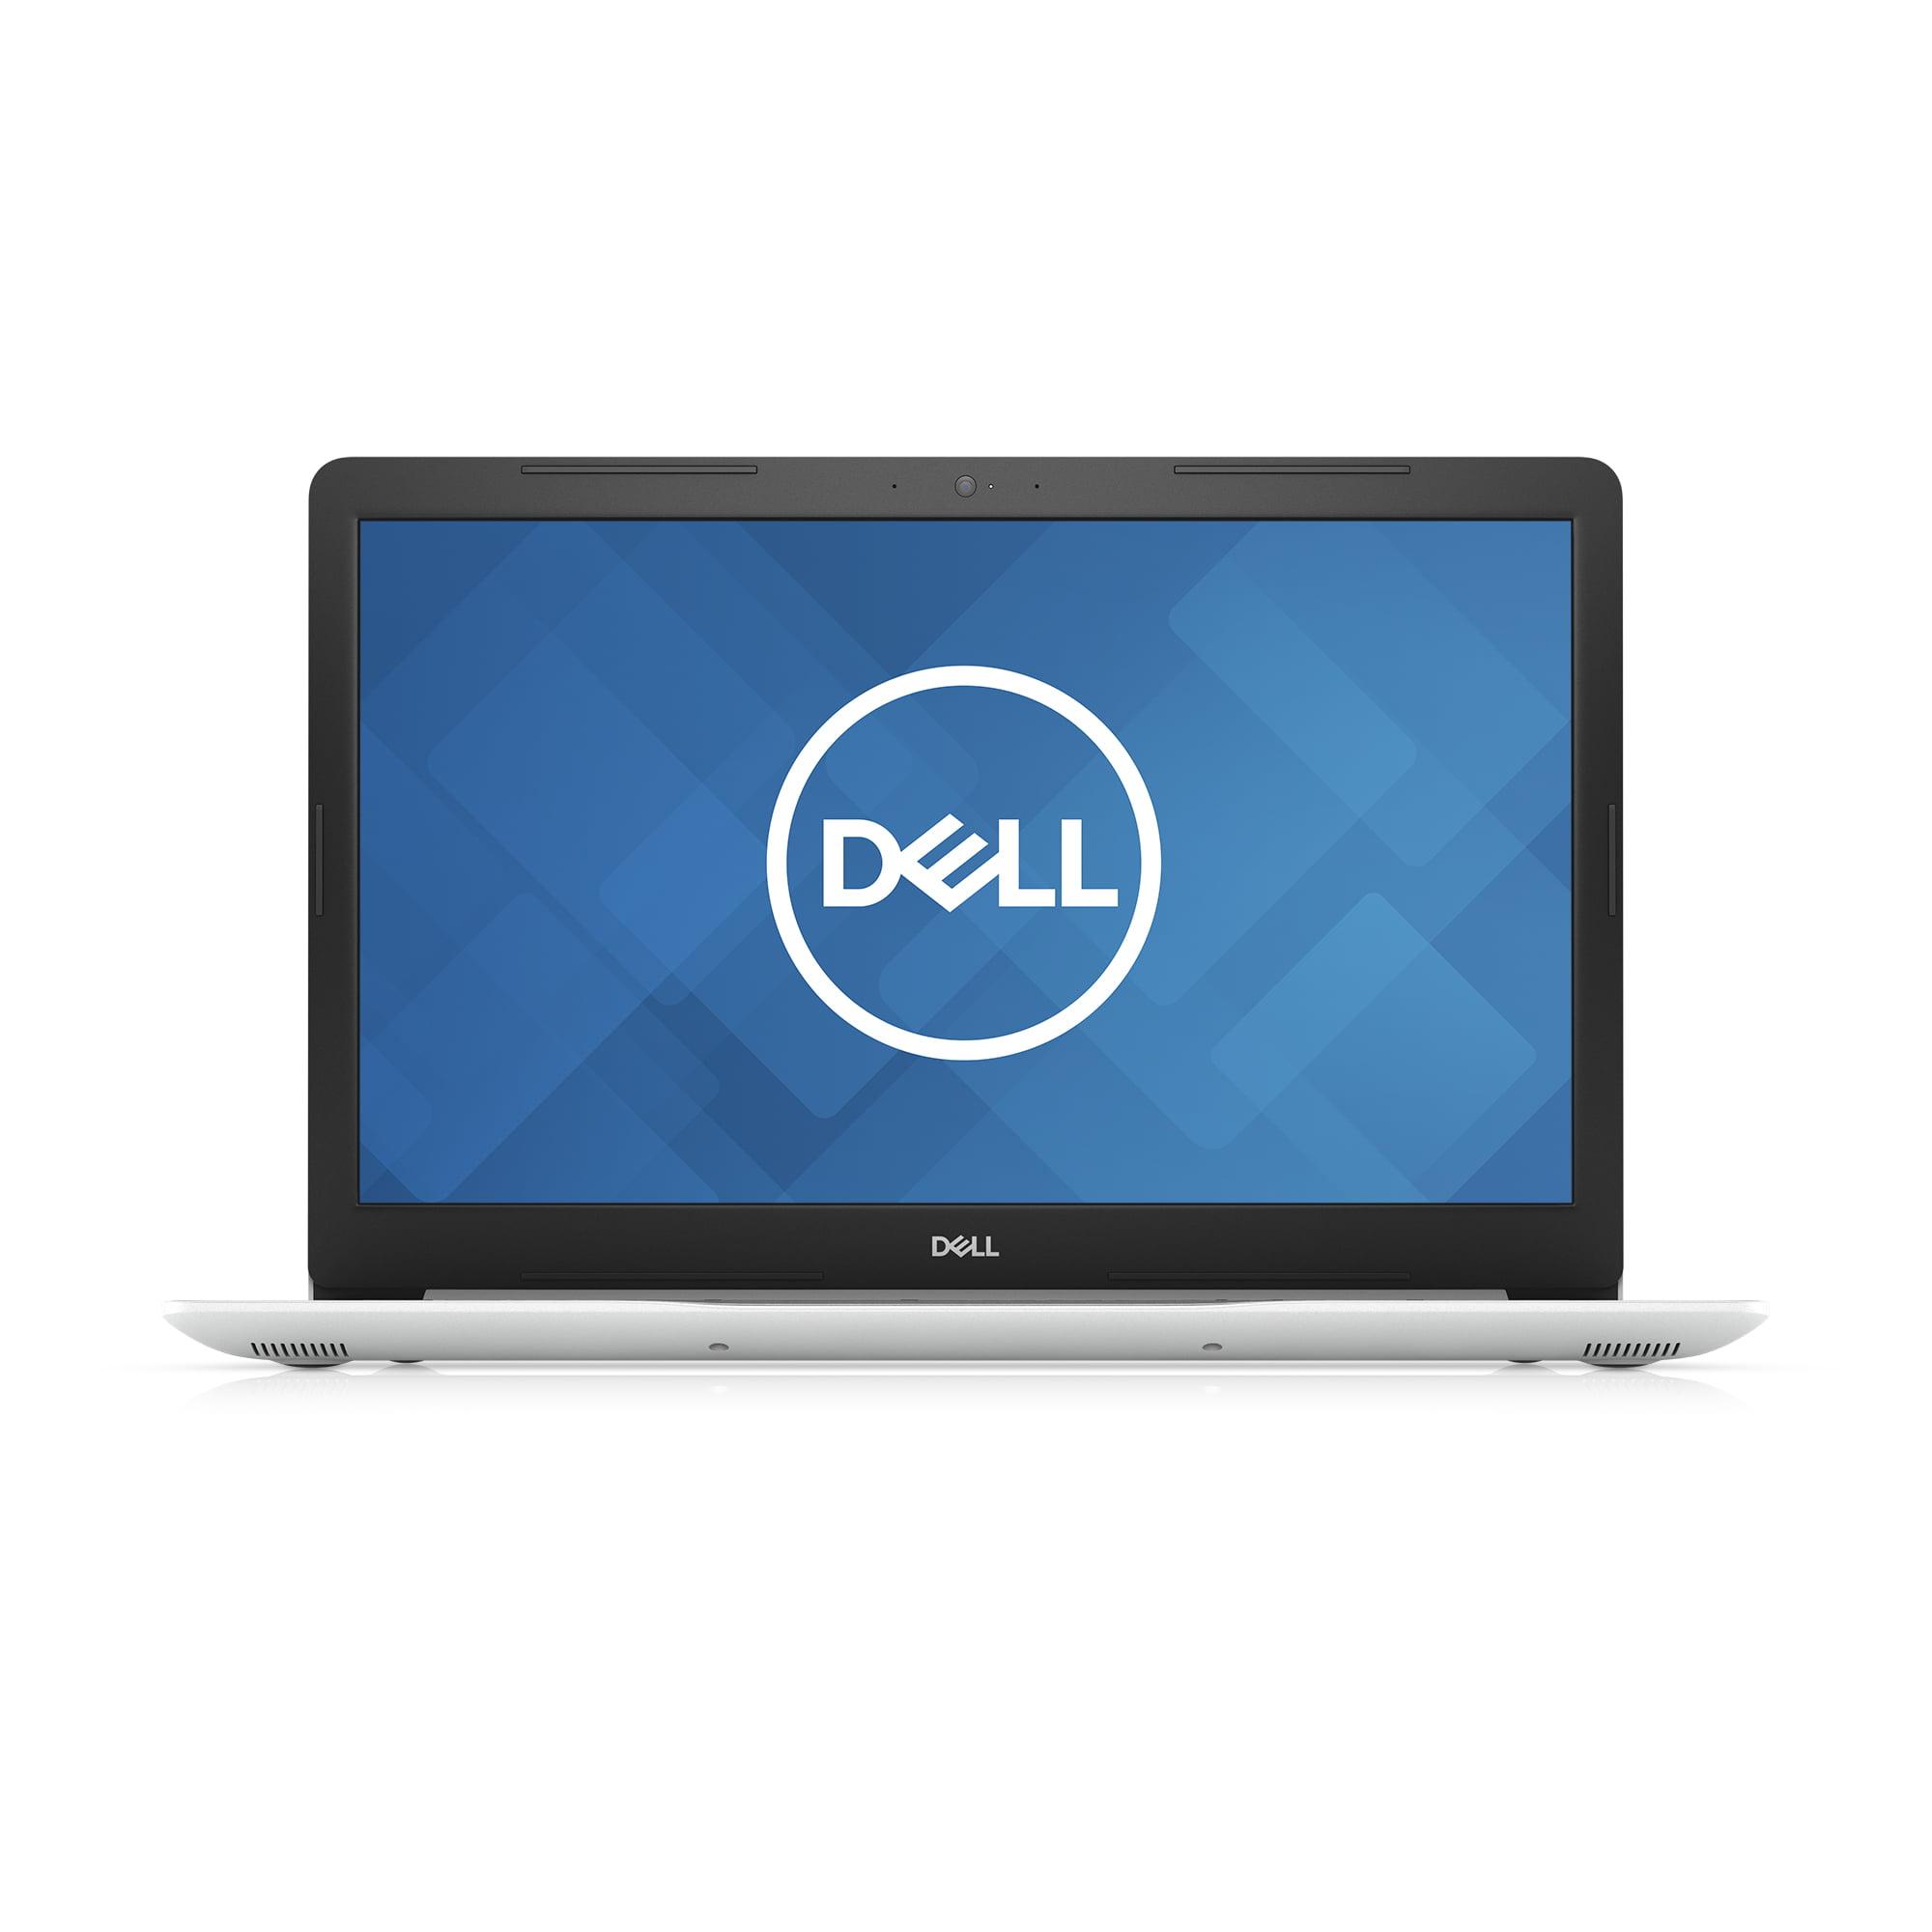 "Dell Inspiron 15 5000 (5575) Laptop, 15.6"", AMD Ryzen 5"